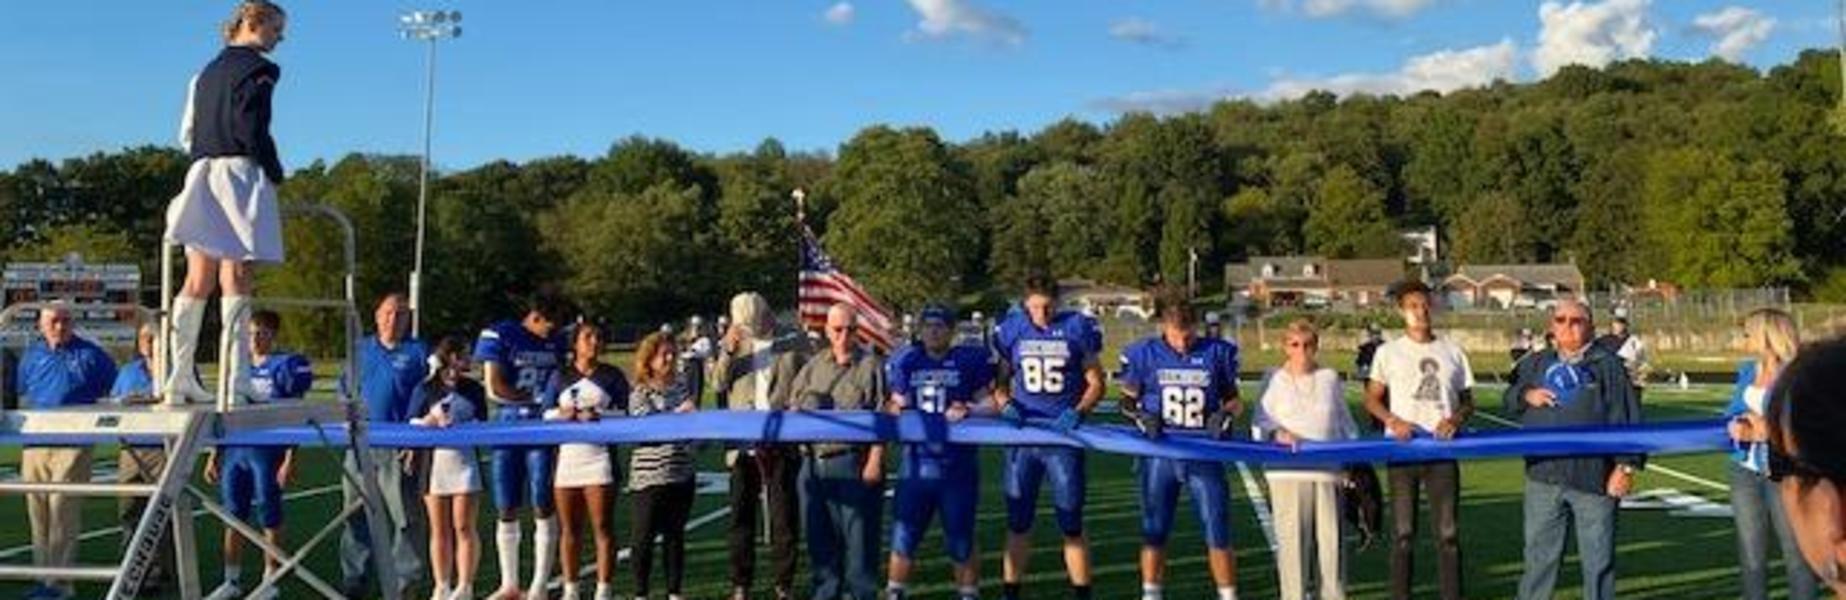 Ribbon Cutting Ceremony - Leechburg's Veterans Field September 10, 2021